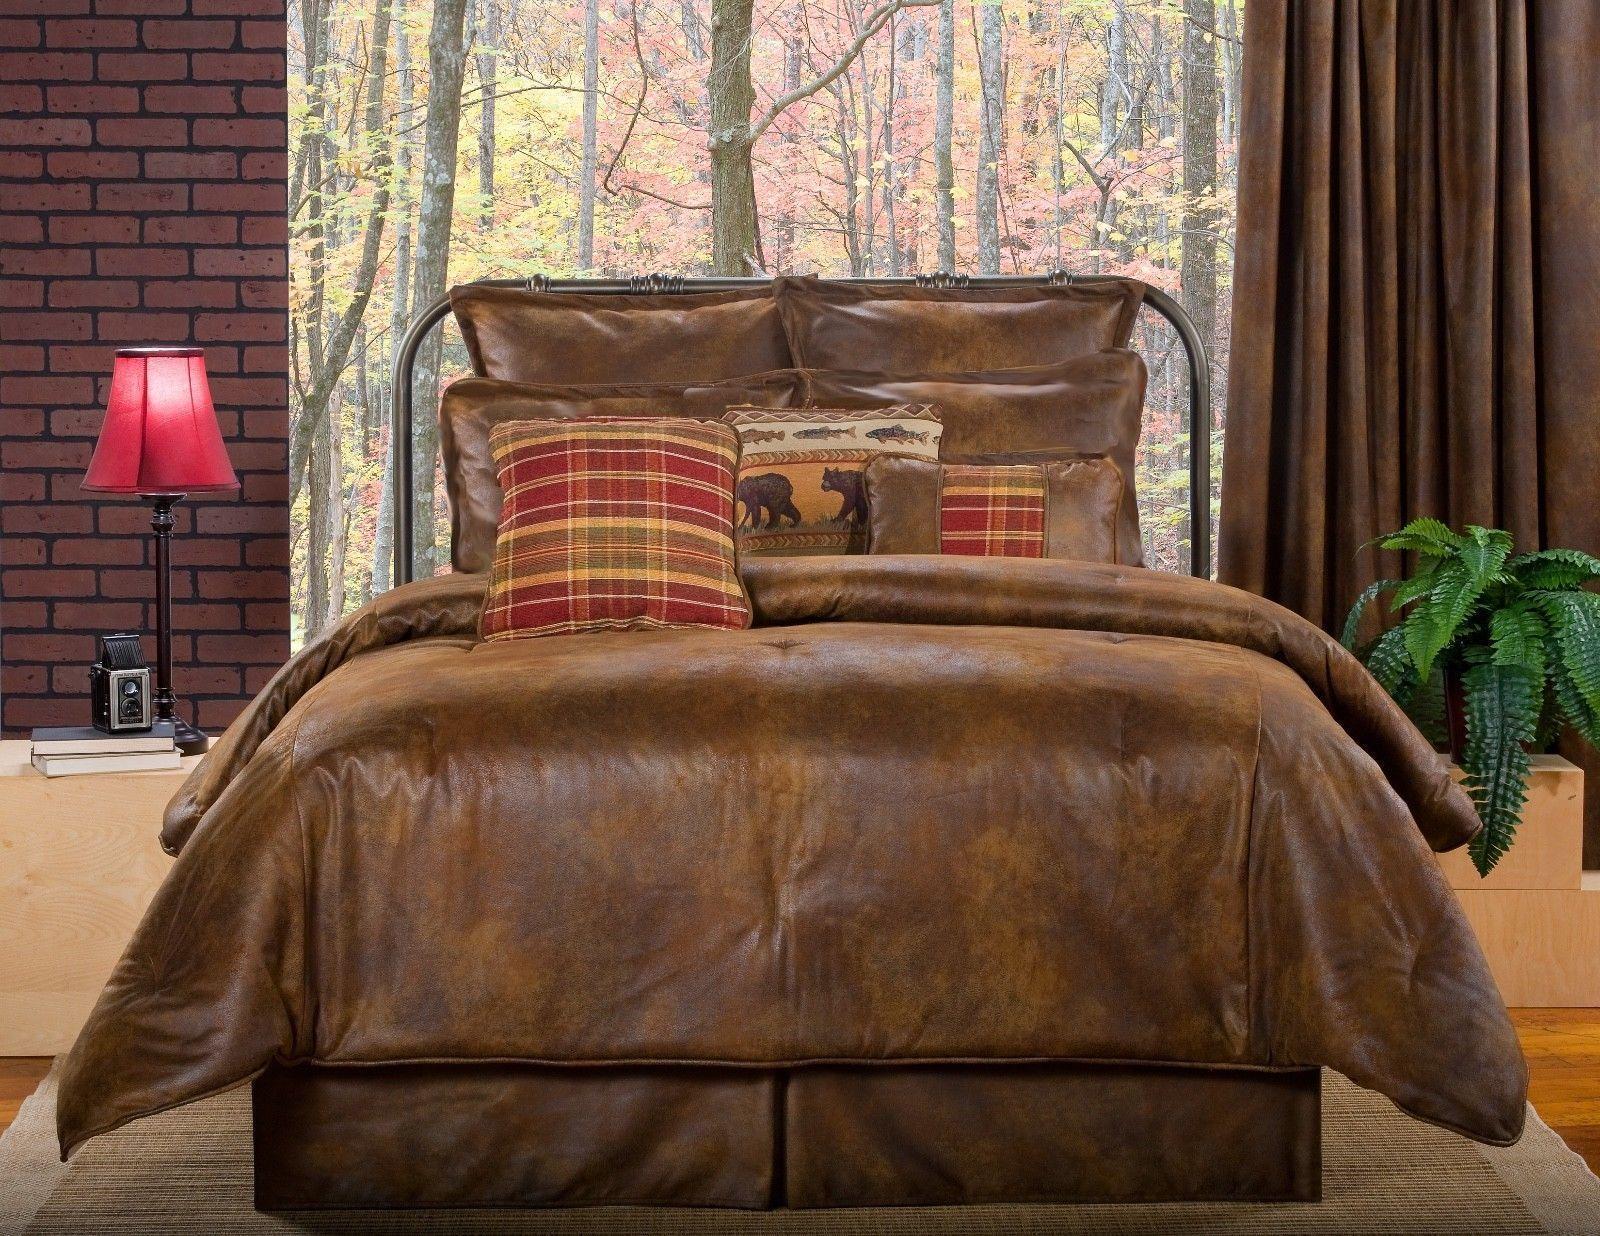 bedding hillcrest zoom p comforters product cabins belk comp dwp a f cf c patchwork collection cabin src desktop layer